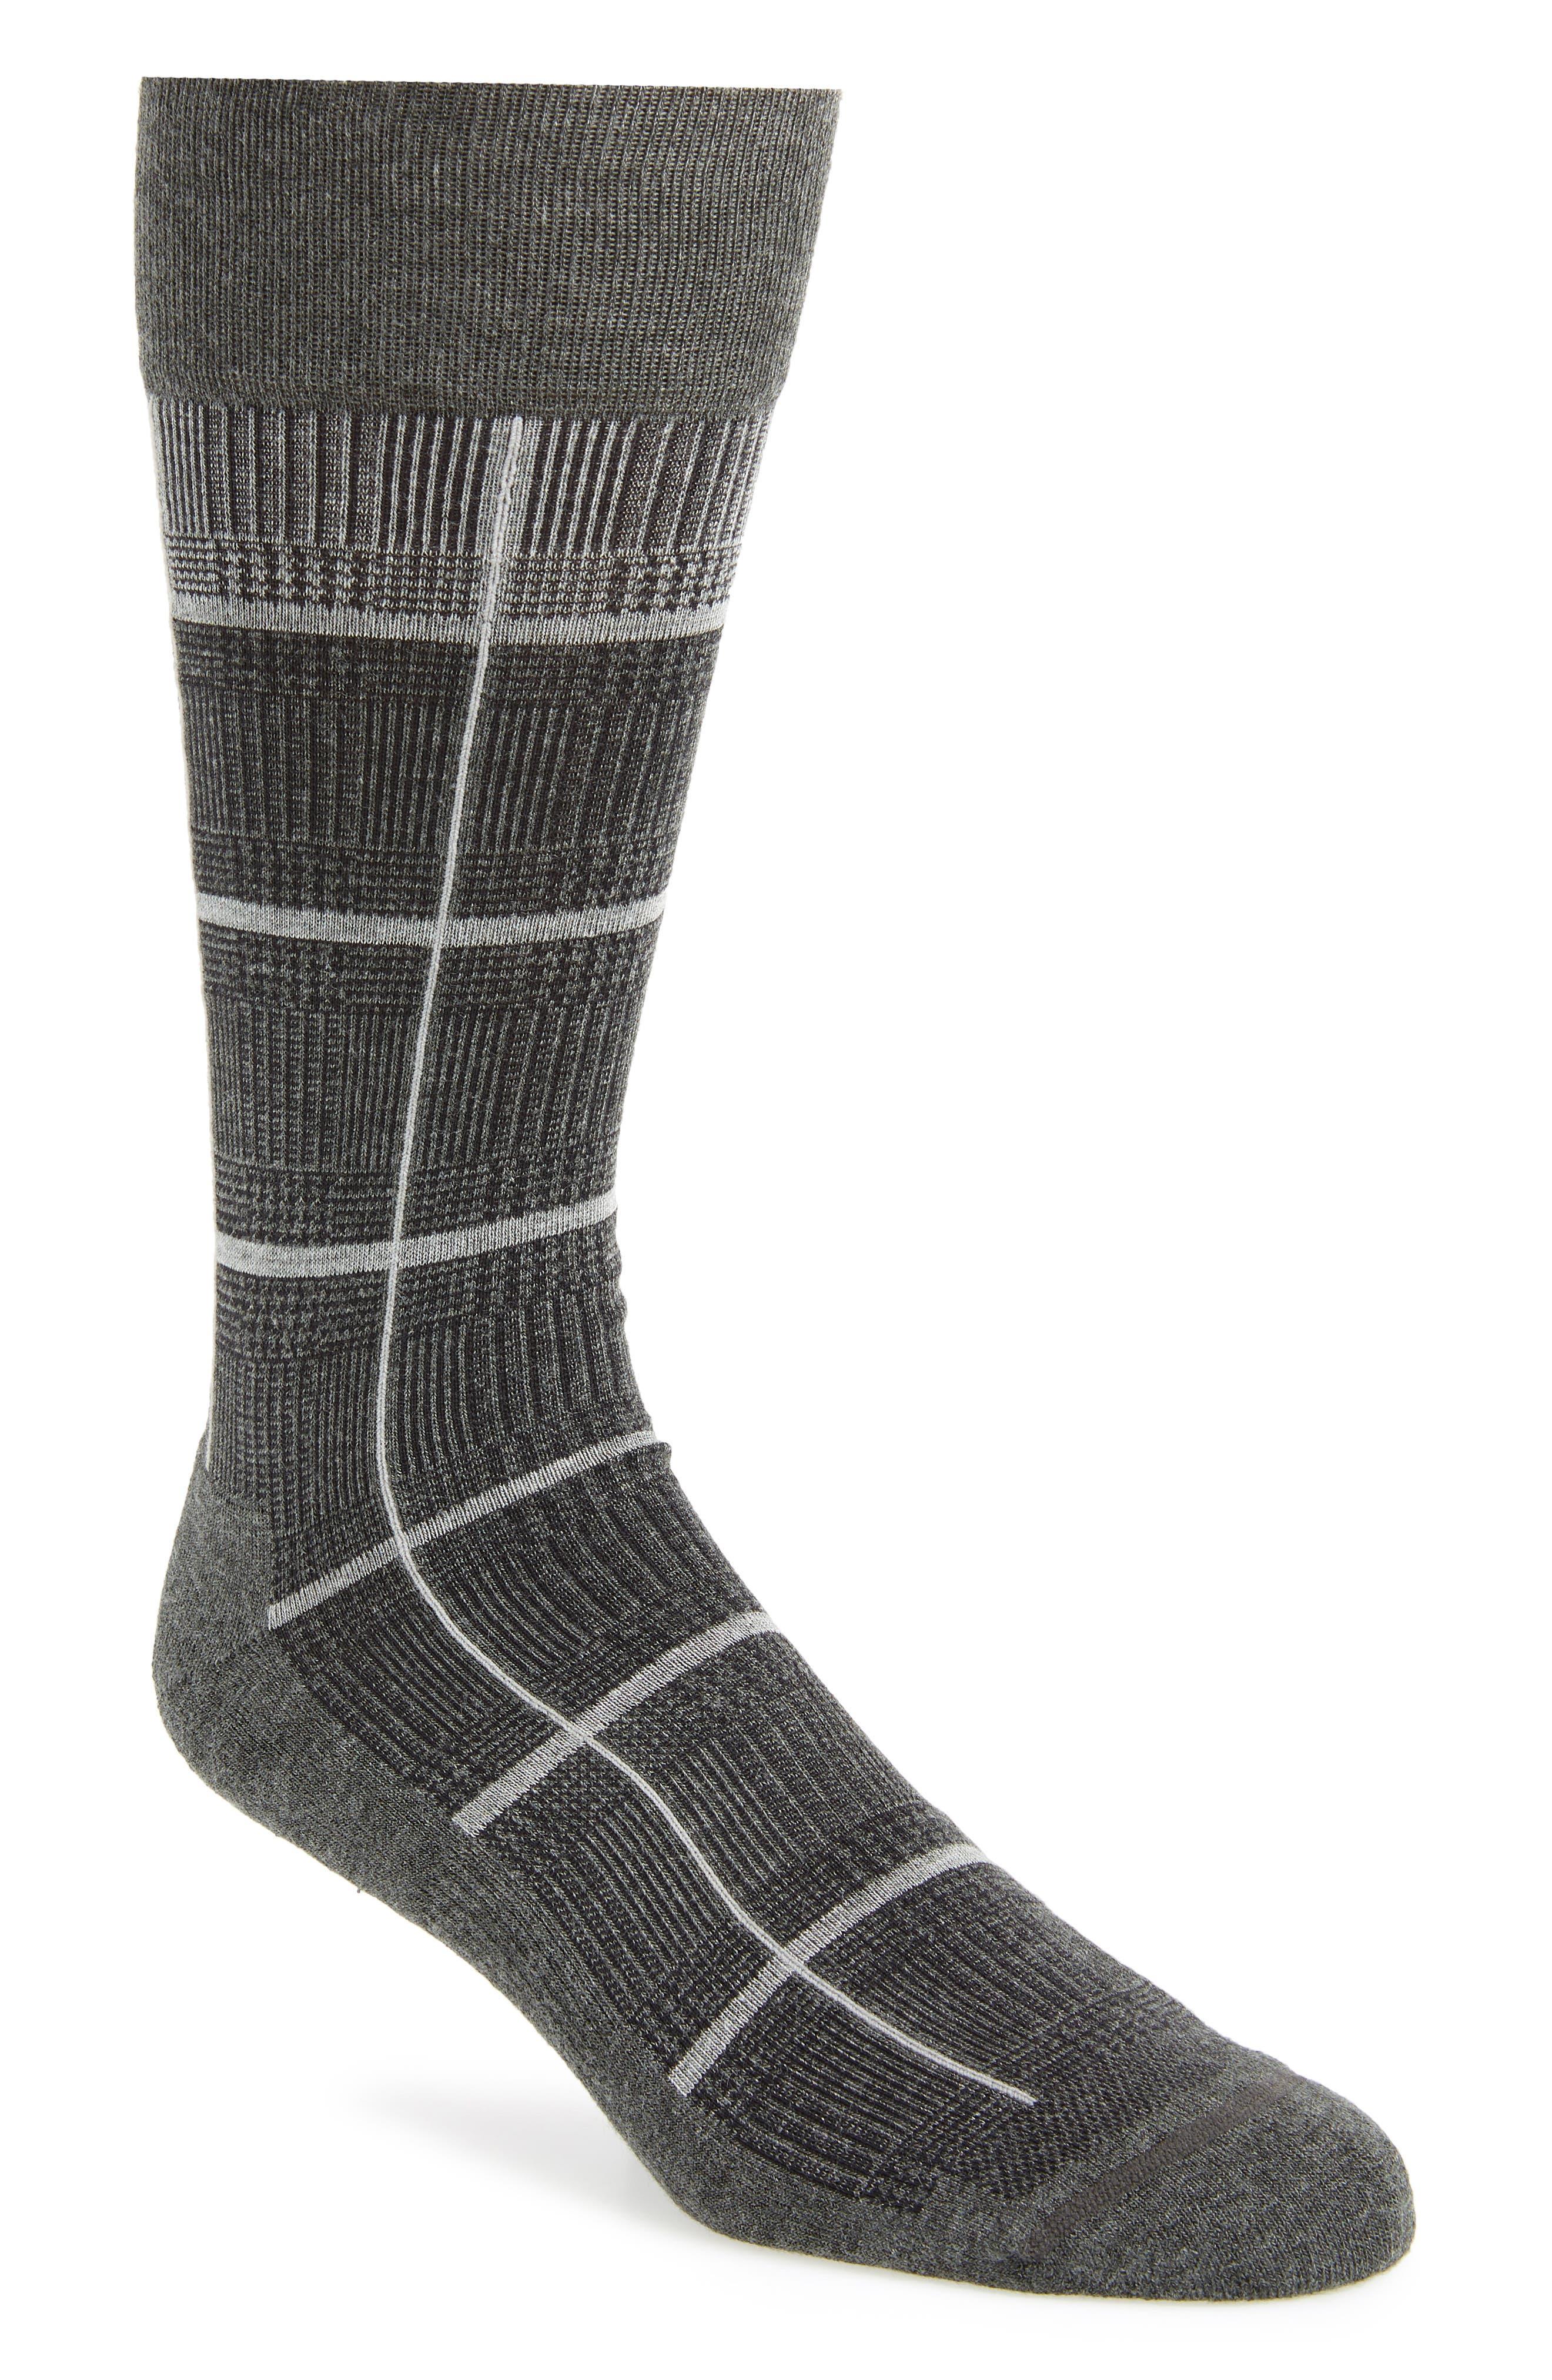 Glen Plaid Socks,                             Main thumbnail 1, color,                             CHARCOAL HEATHER